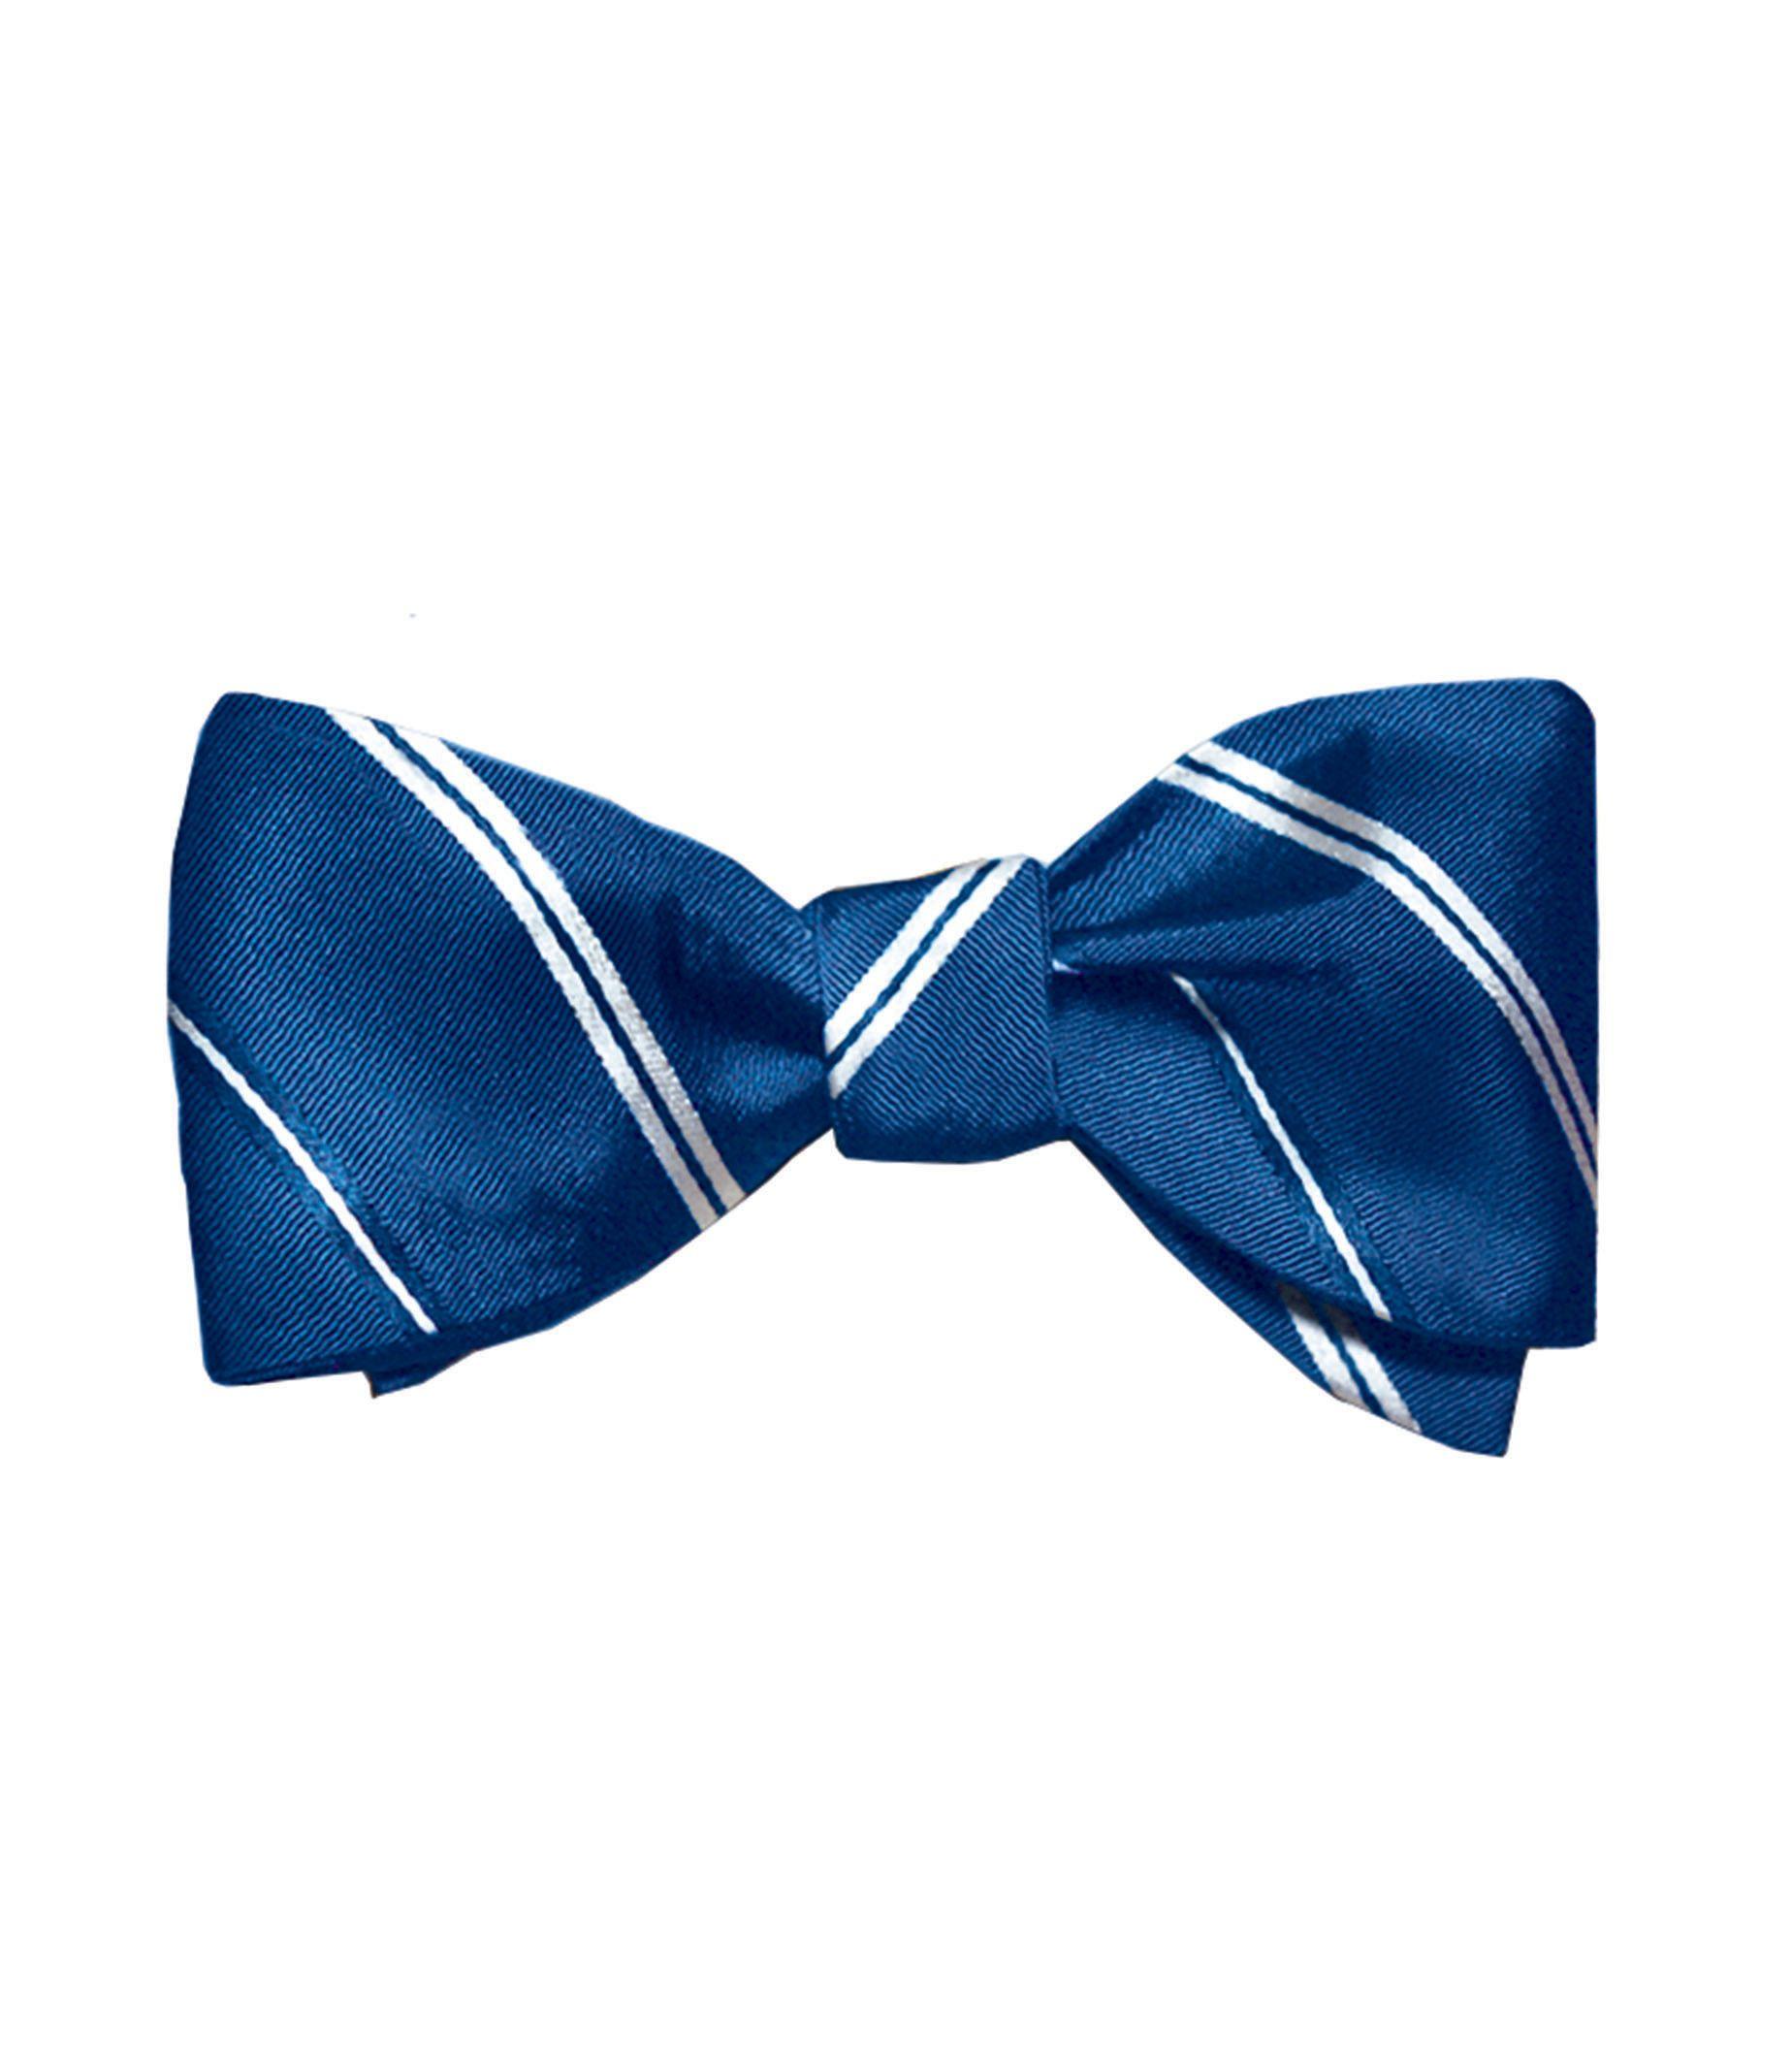 Executive Thin Alternating Stripes Bowtie